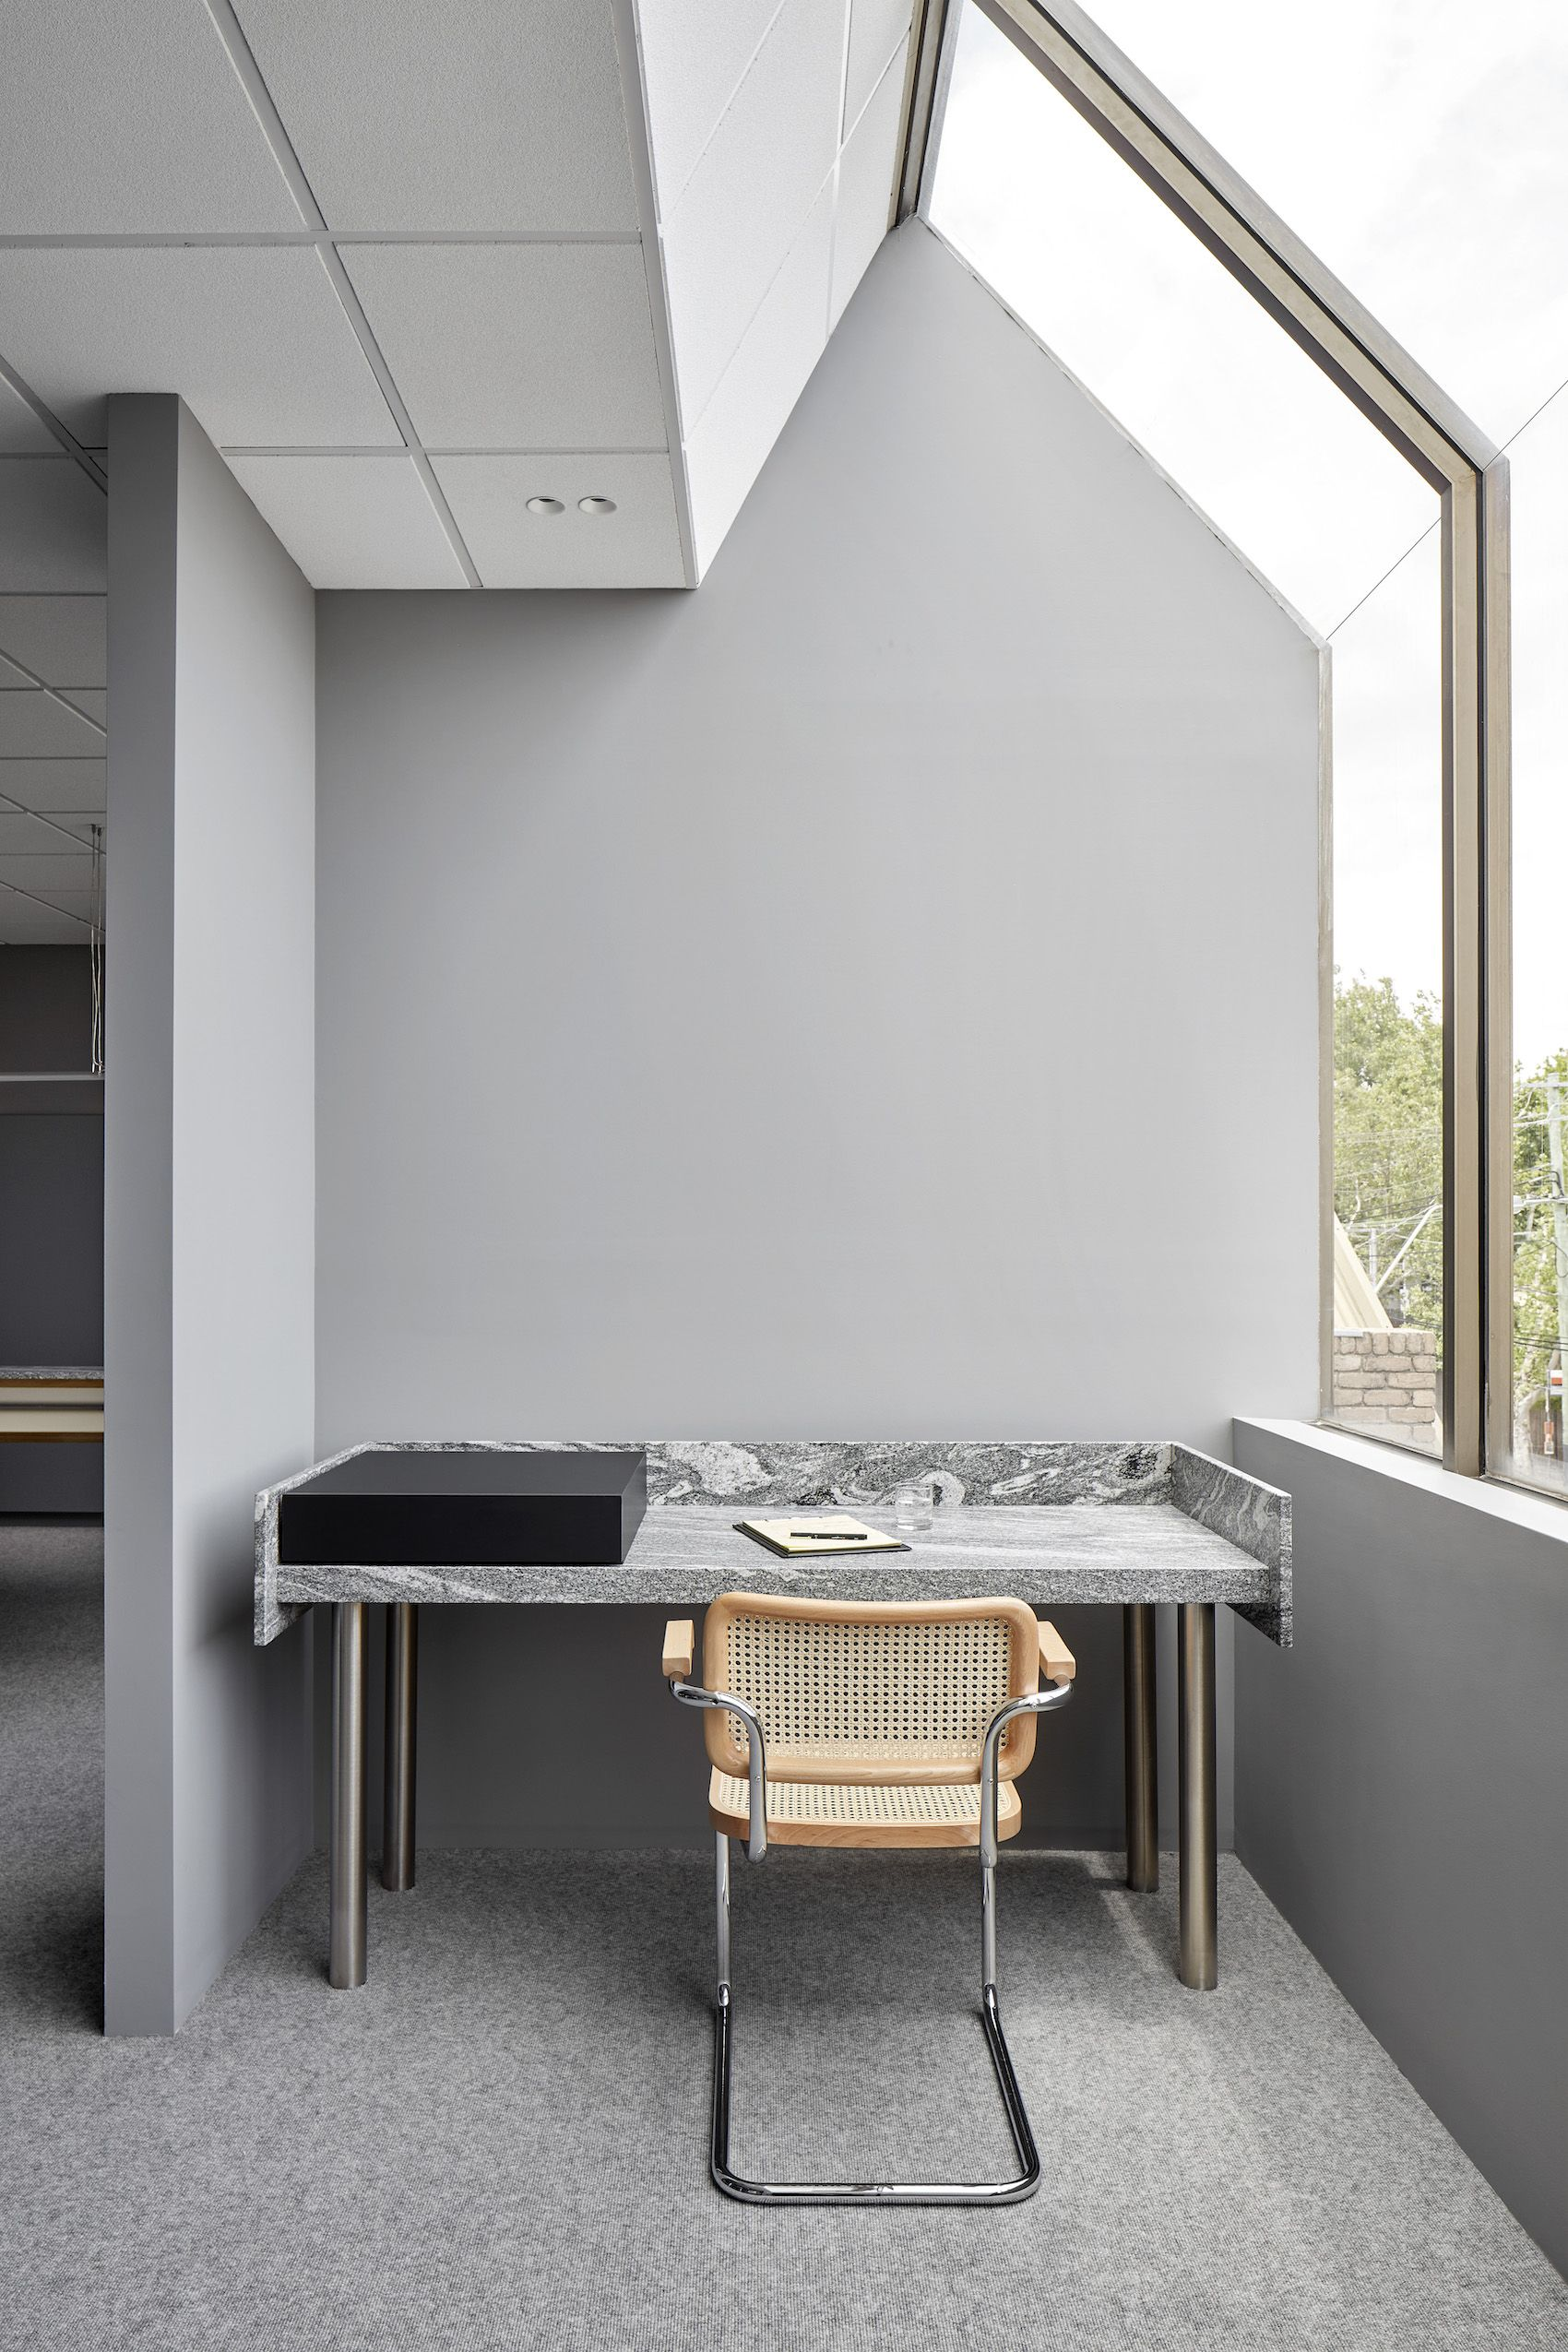 Davidov Architects Studio Studio Interior Architect Design Architecture House